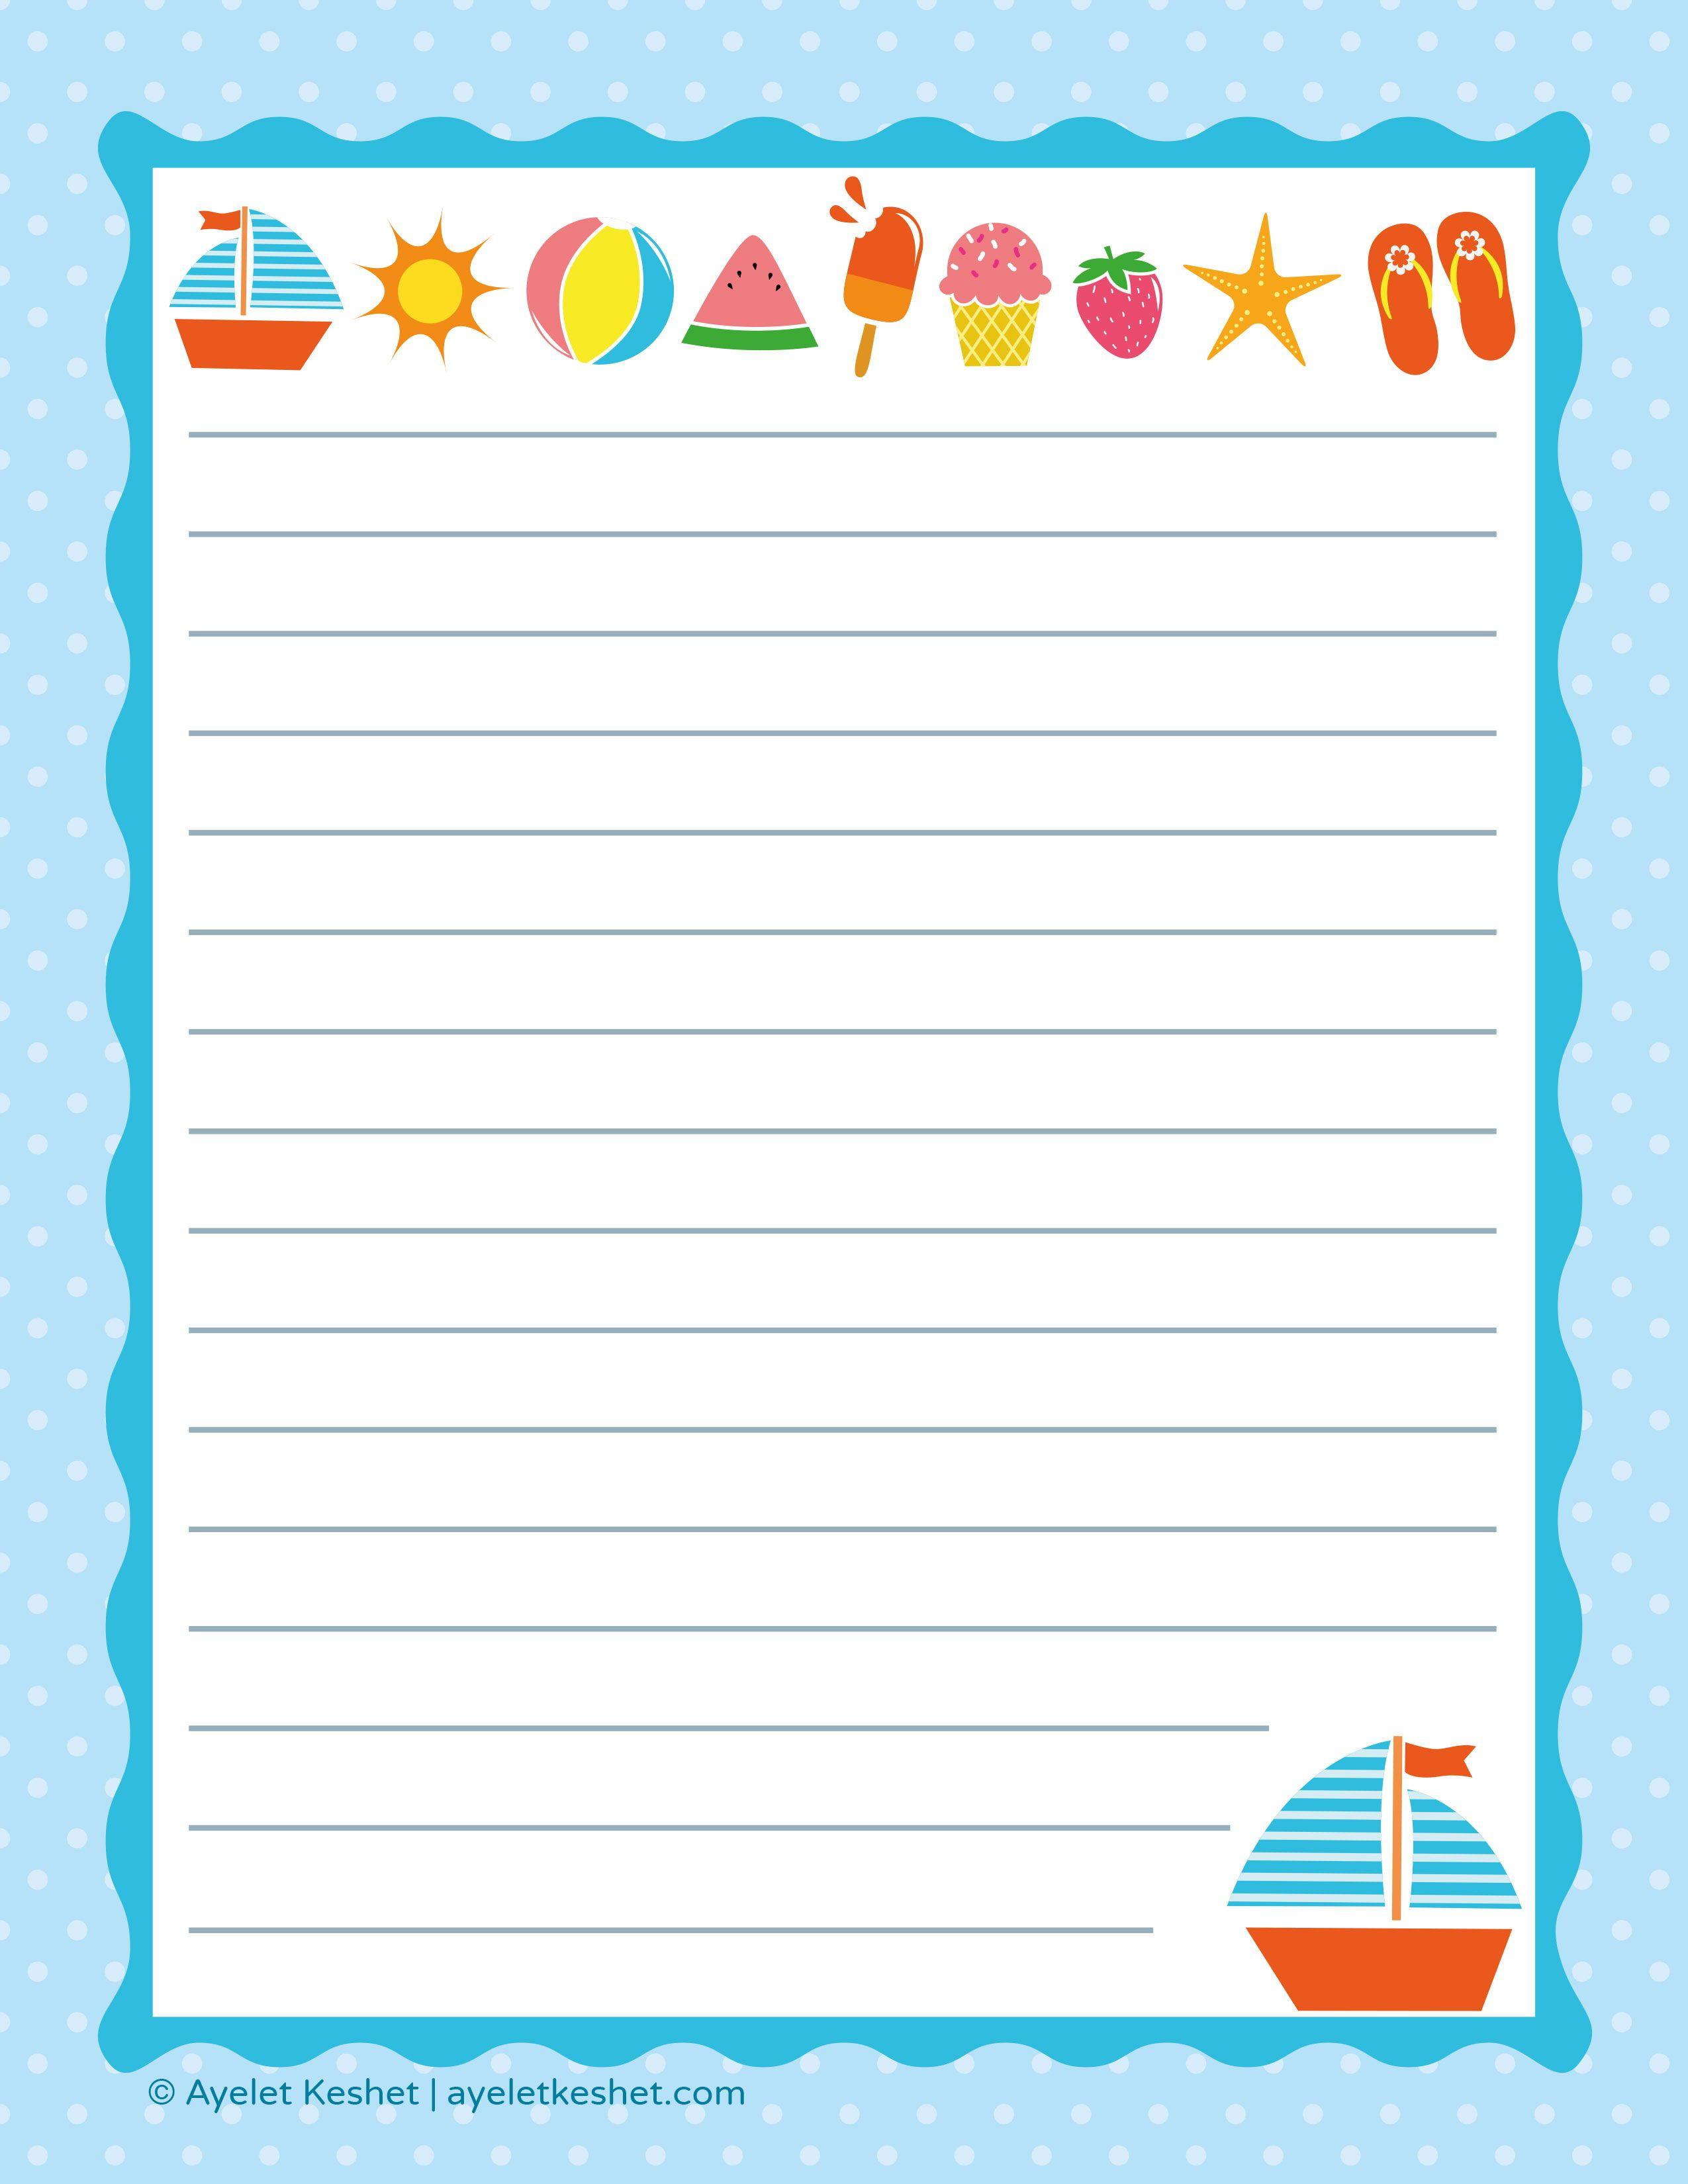 Free Printable Letter Paper | Printables To Go | Pinterest | Free - Free Printable Paper